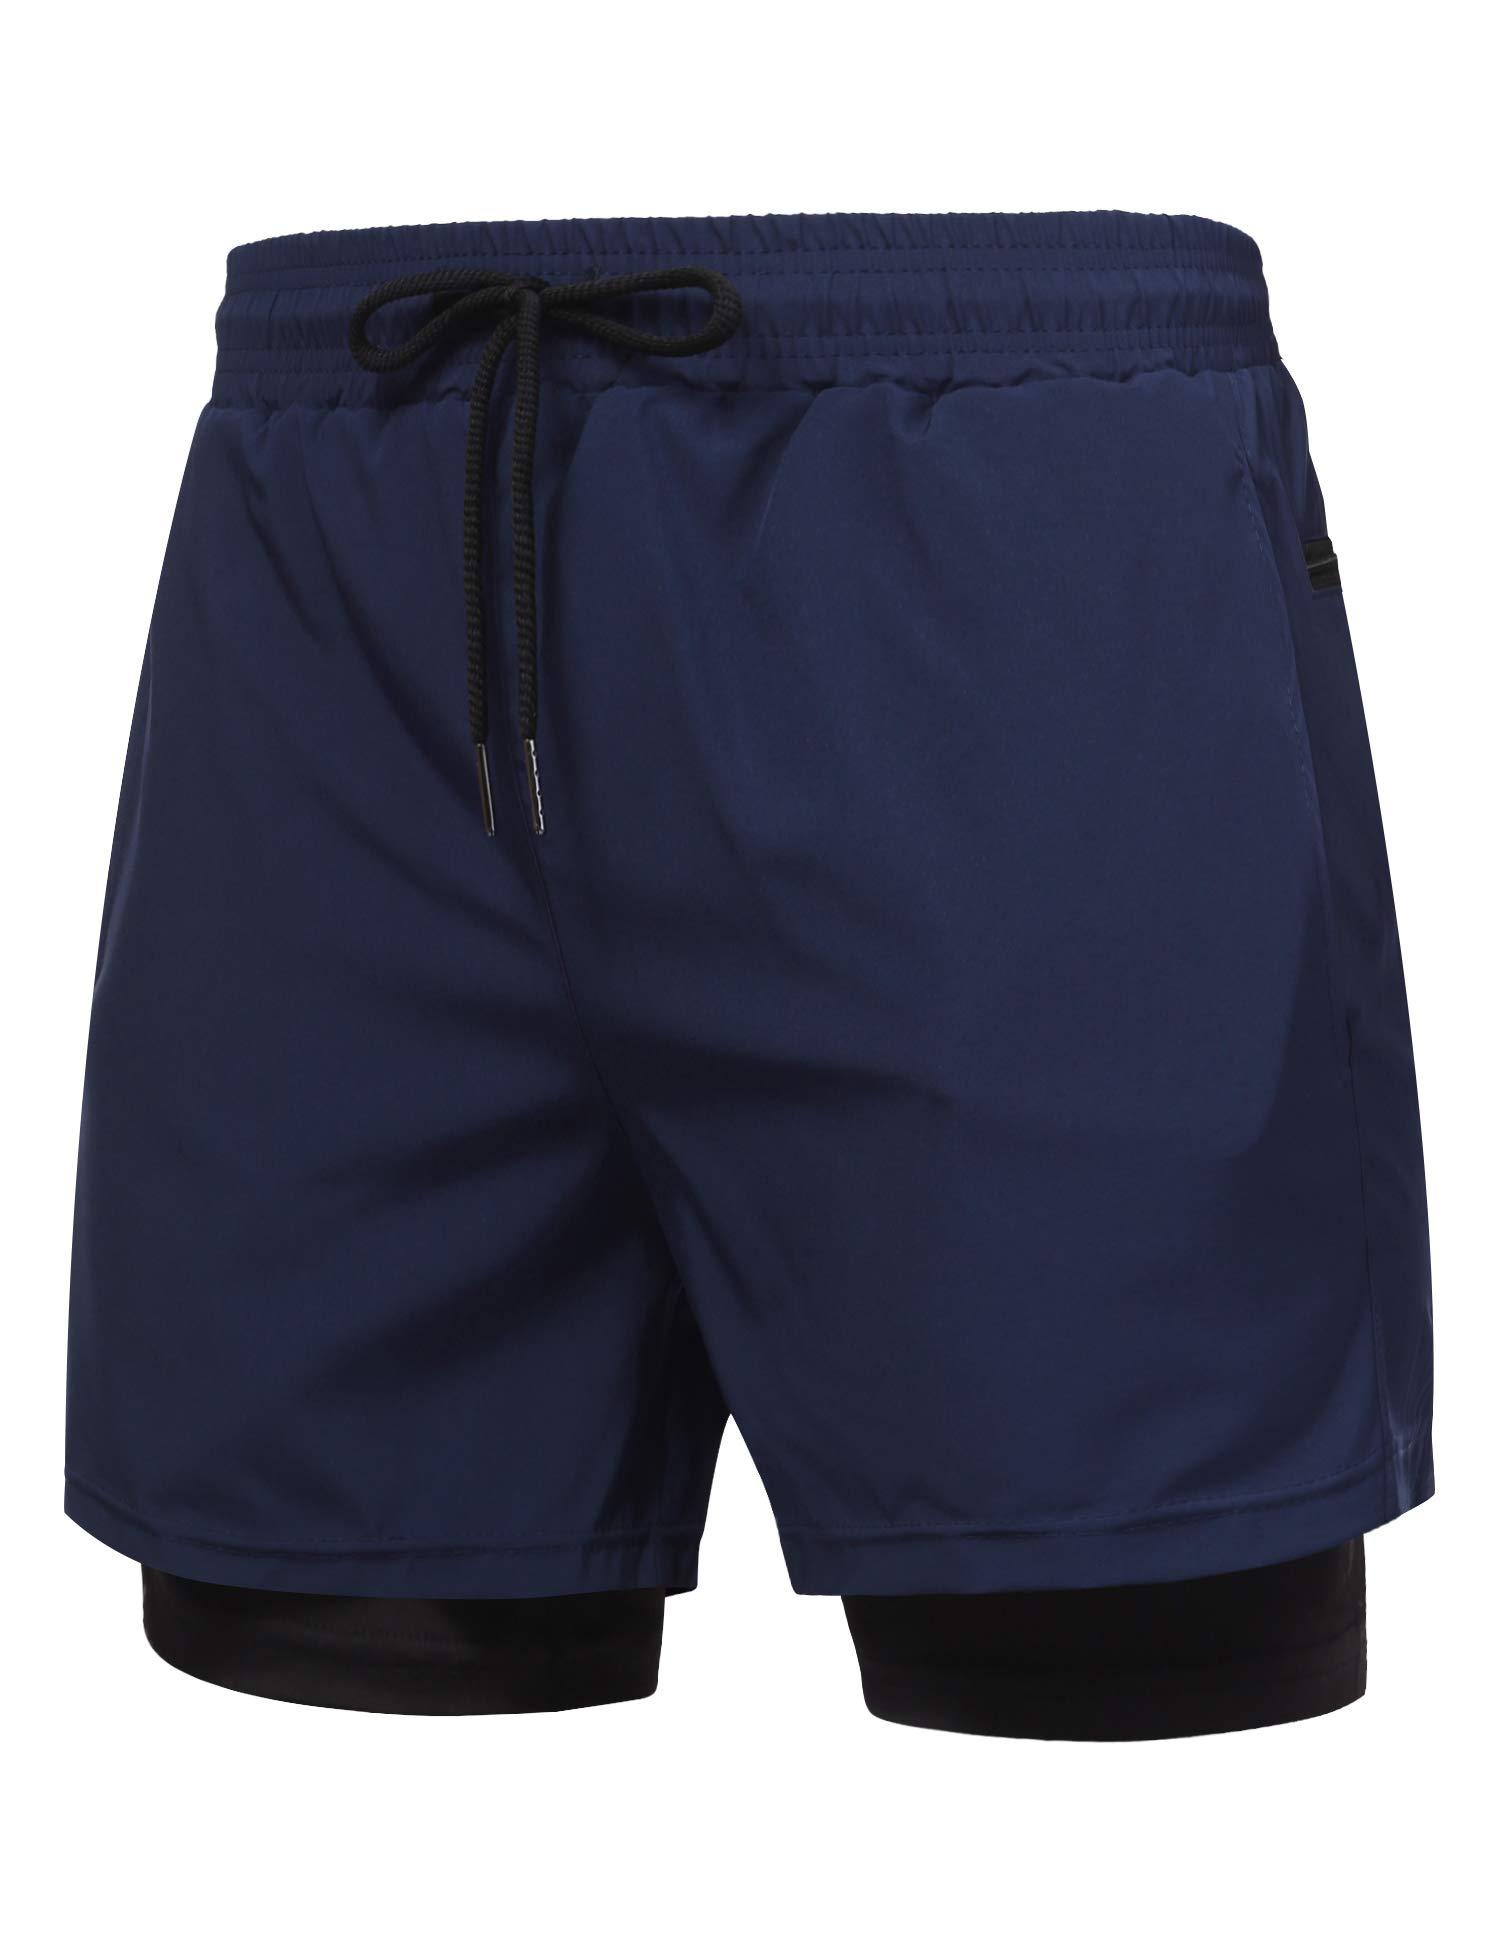 COOFANDY Men's 2 in 1 Active Short Elasticity Lightweight Quick Dry Jogger Shorts